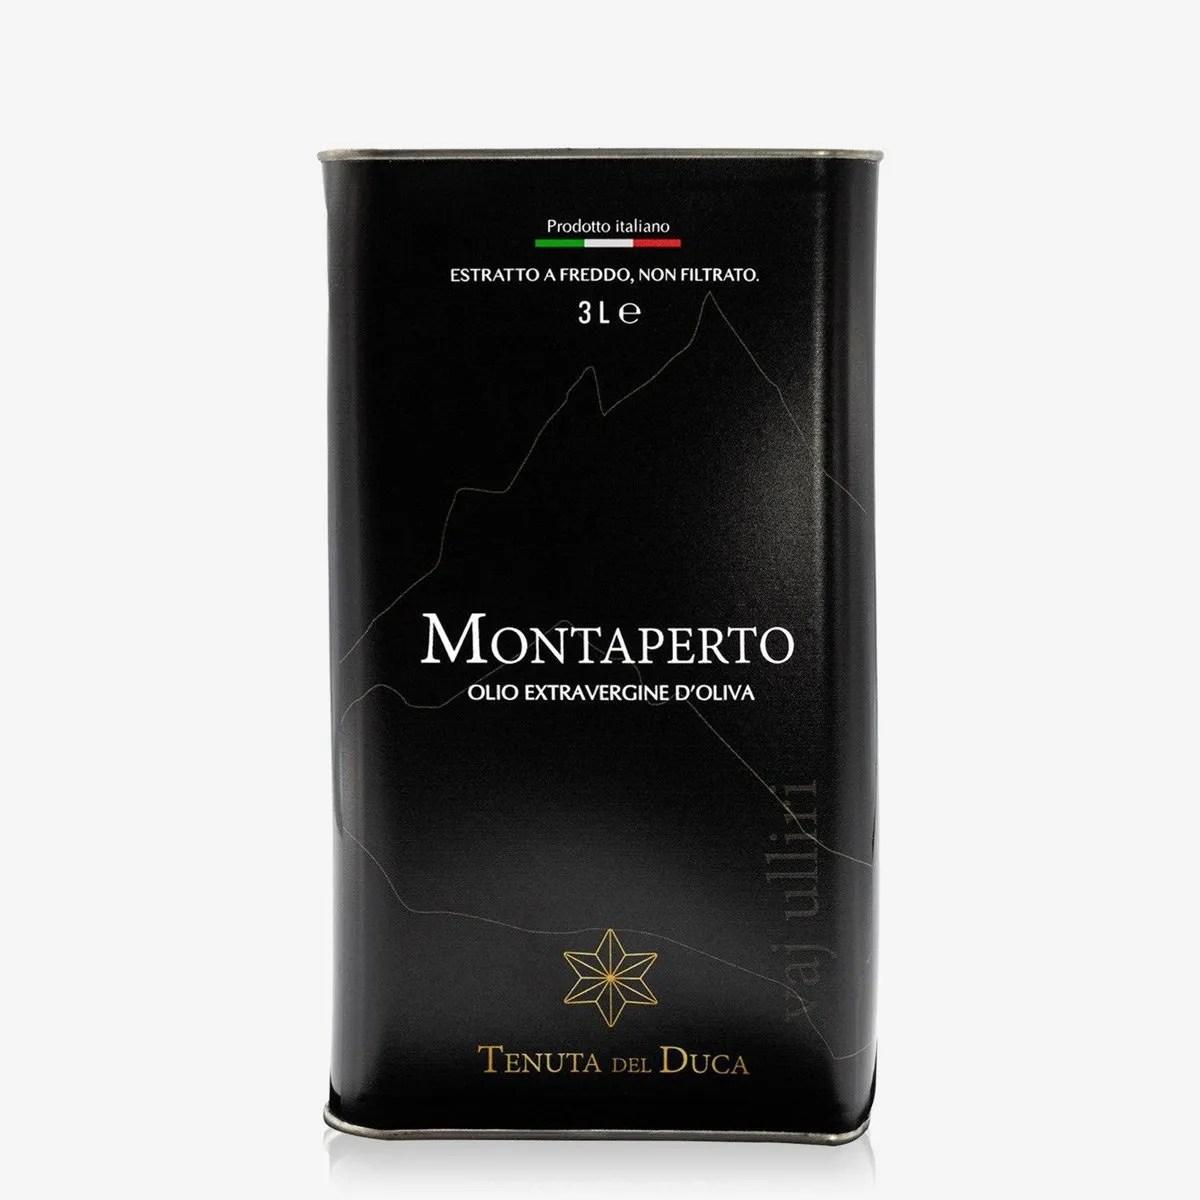 3L Montaperto Latta Olio -Tenuta del Duca.jpg